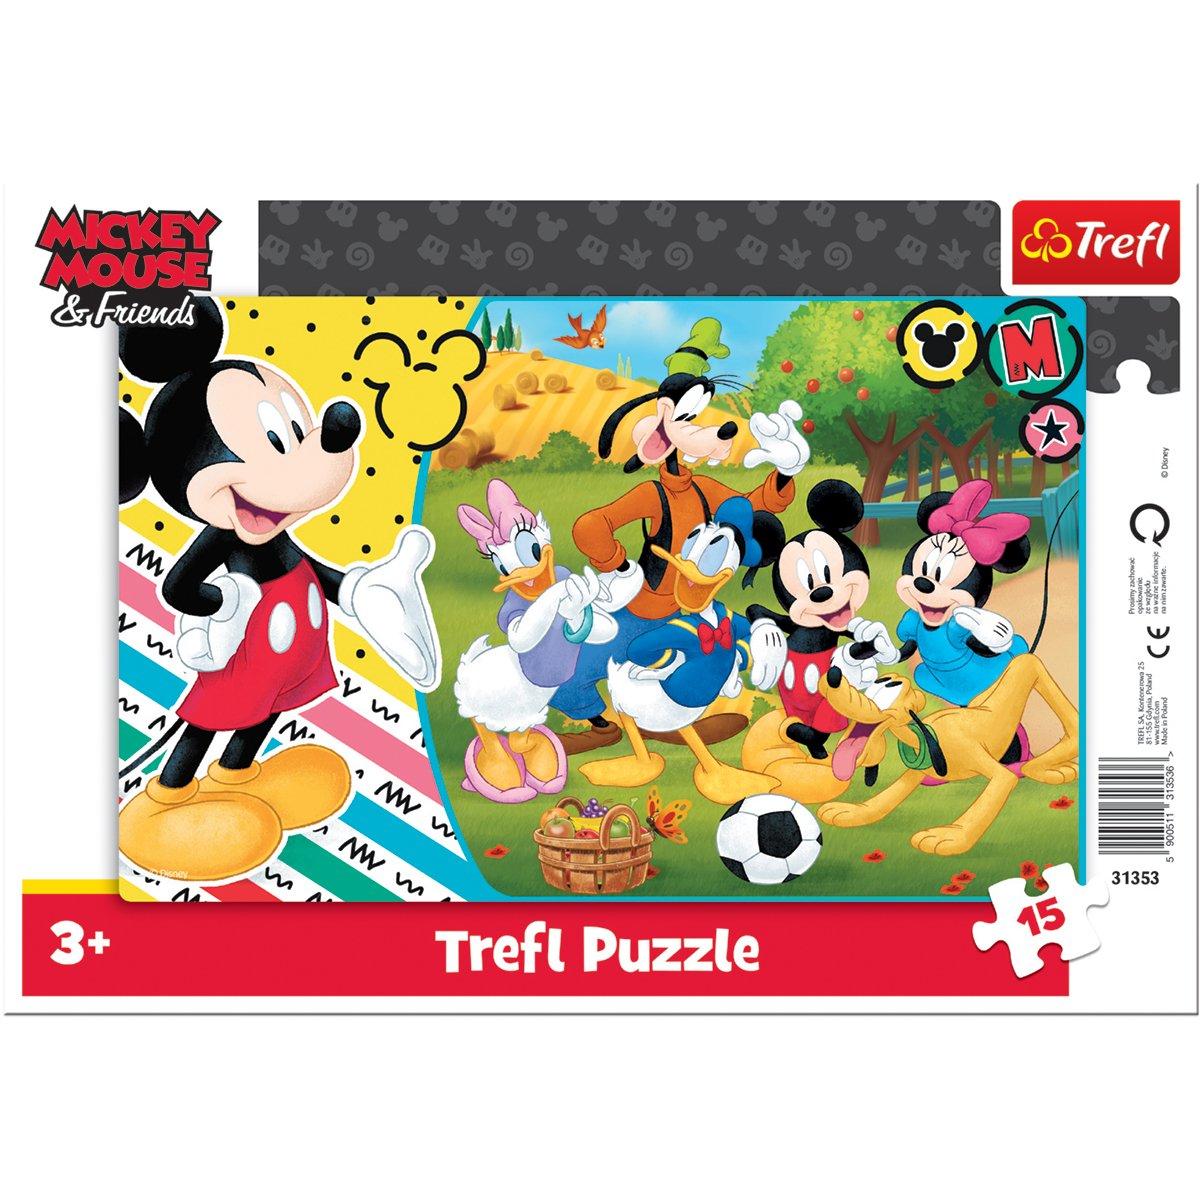 Puzzle Trefl 15 piese in rama, Mickey la tara, Disney Mickey Mouse